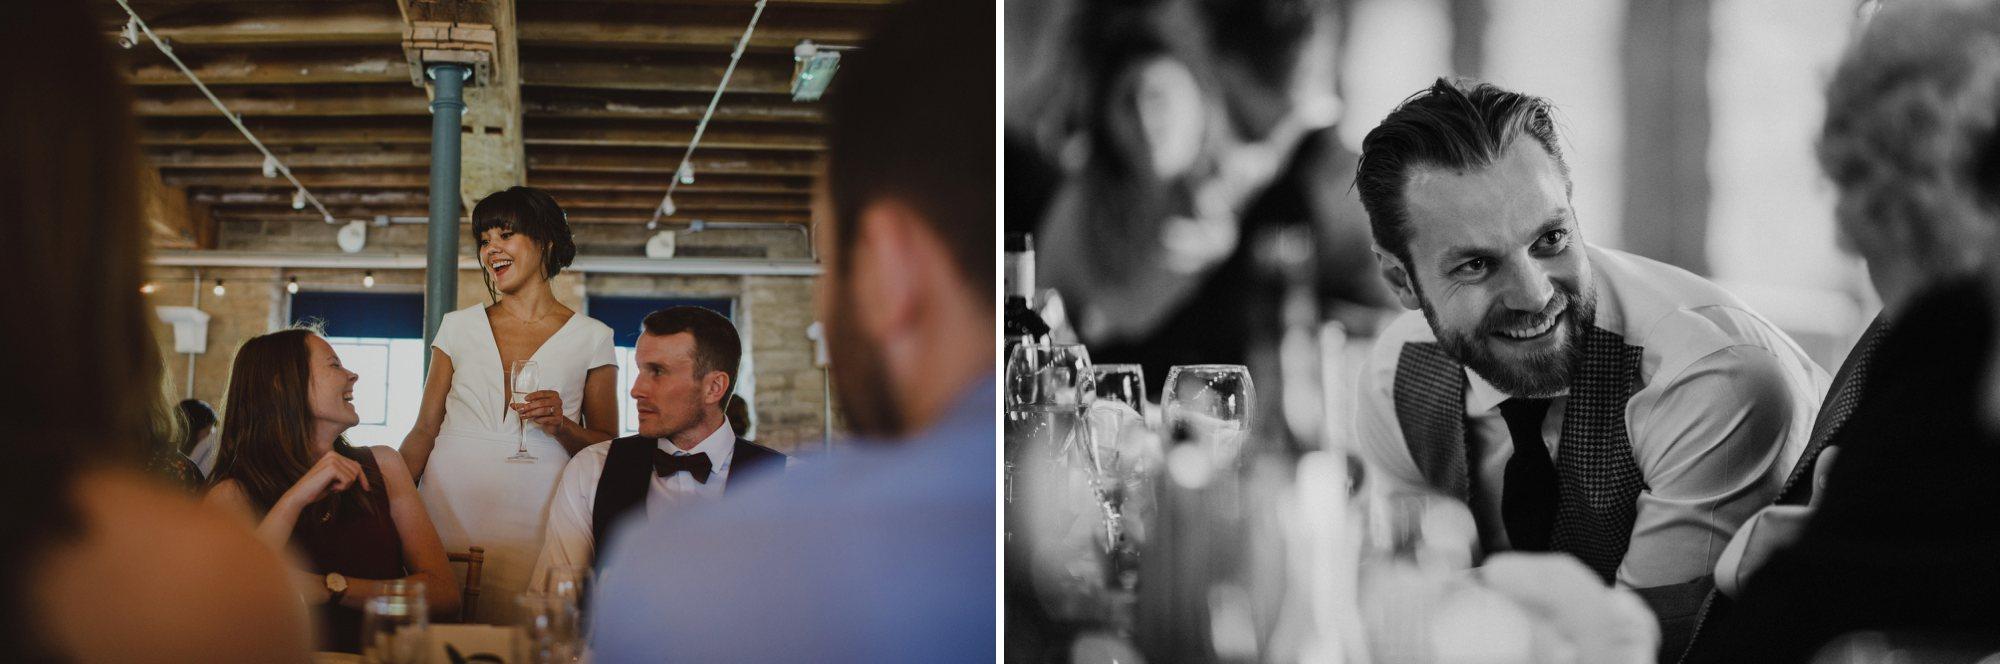 standedge-wedding-marsden-huddersfield_0056.jpg